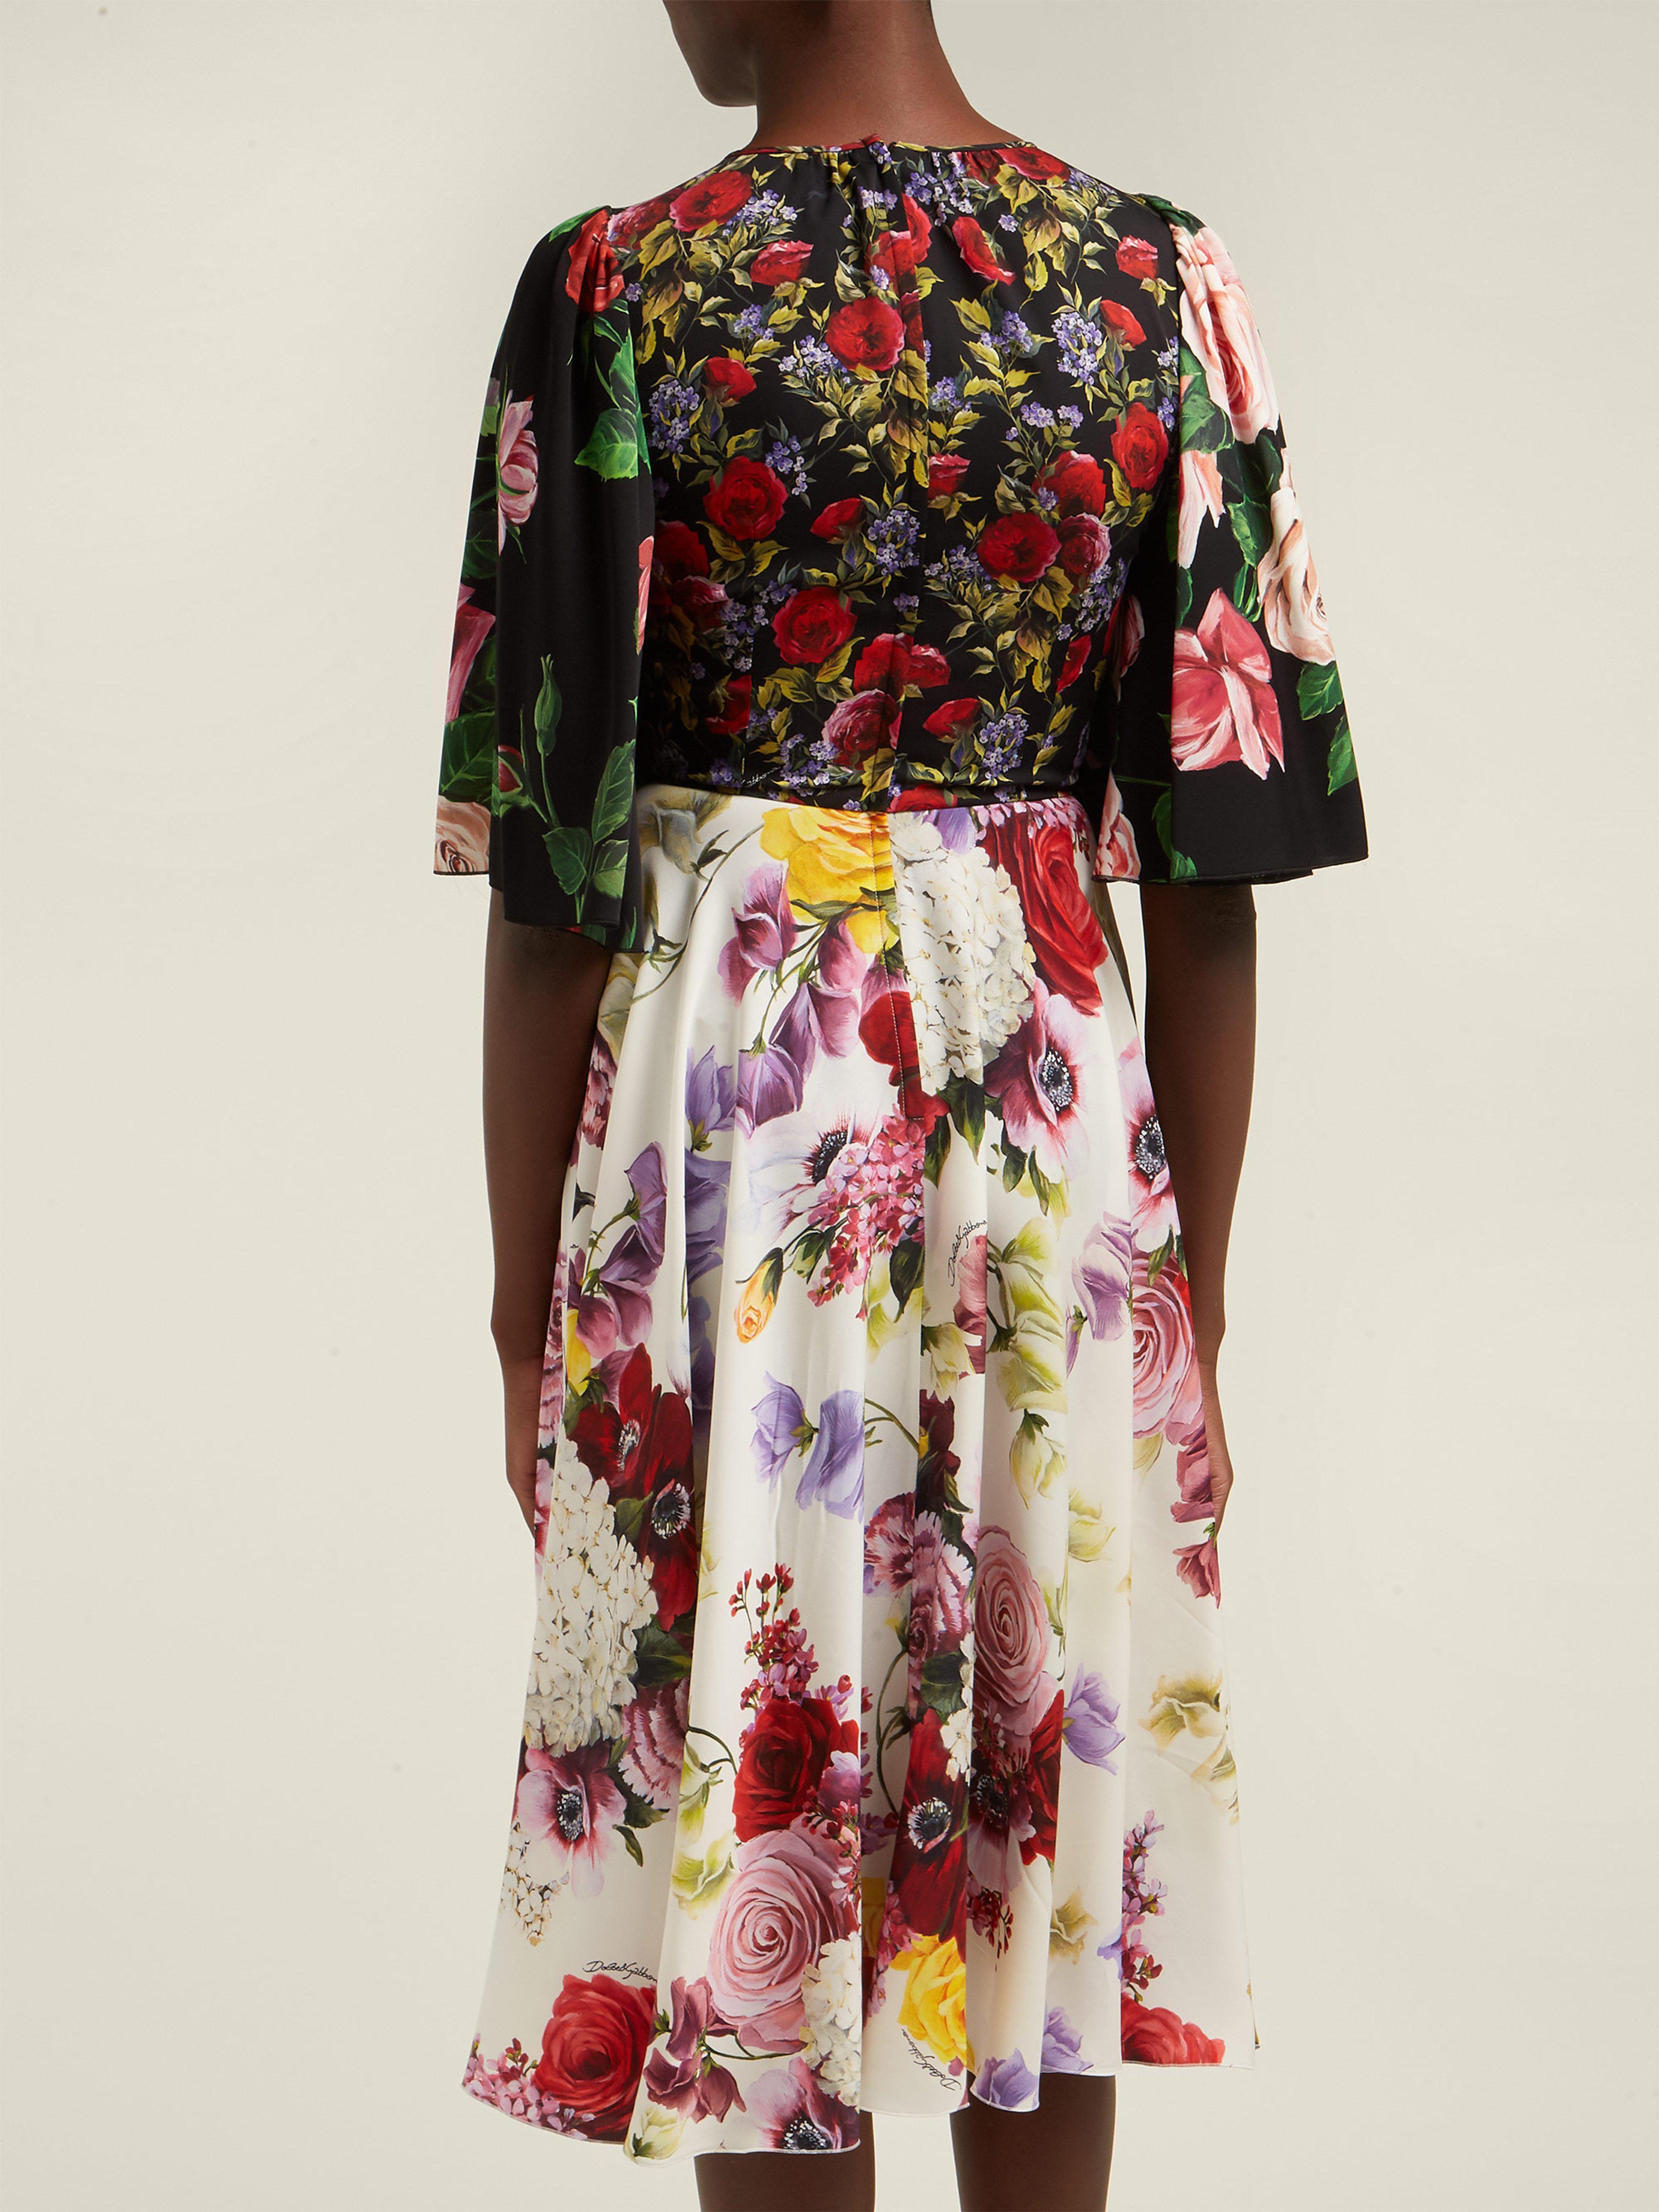 71a686d1 Dolce & Gabbana - Black Rose And Hydrangea Print Silk Charmeuse Midi Dress  - Lyst. View fullscreen